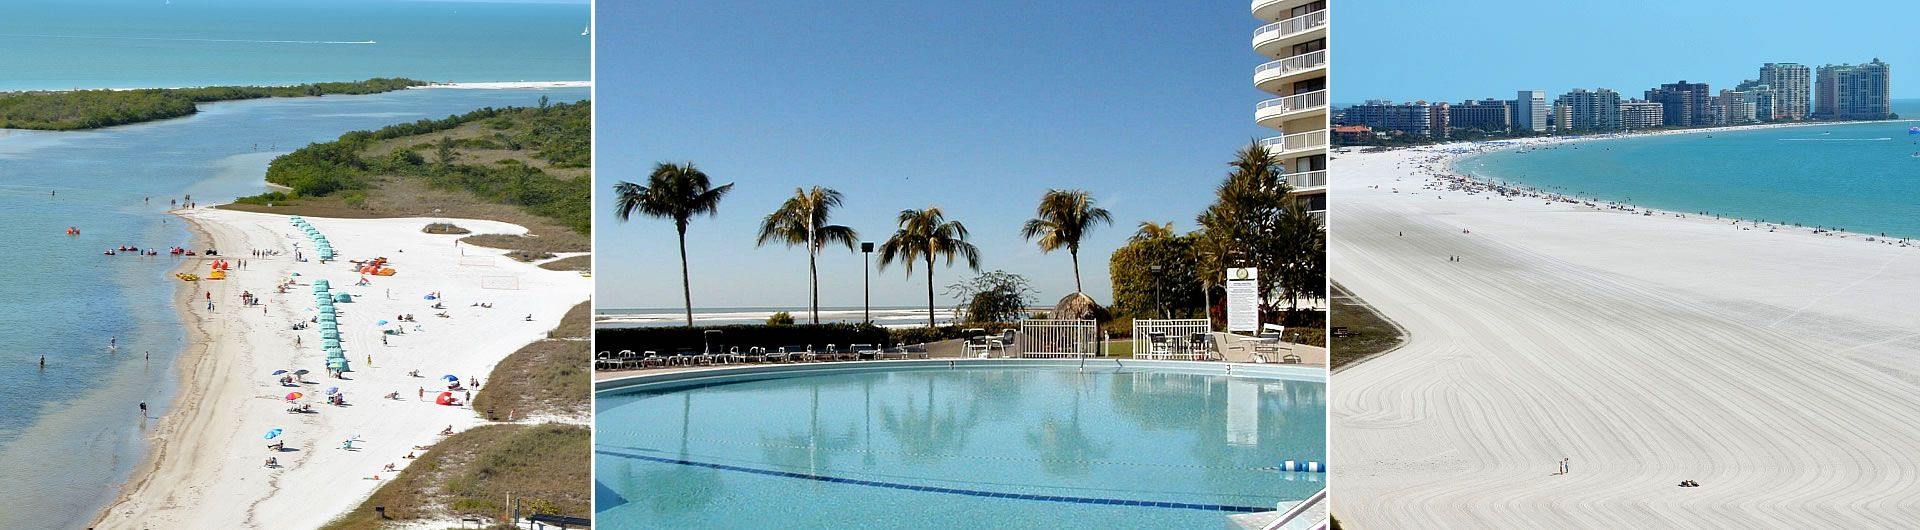 Marco Island beach and Towers pool